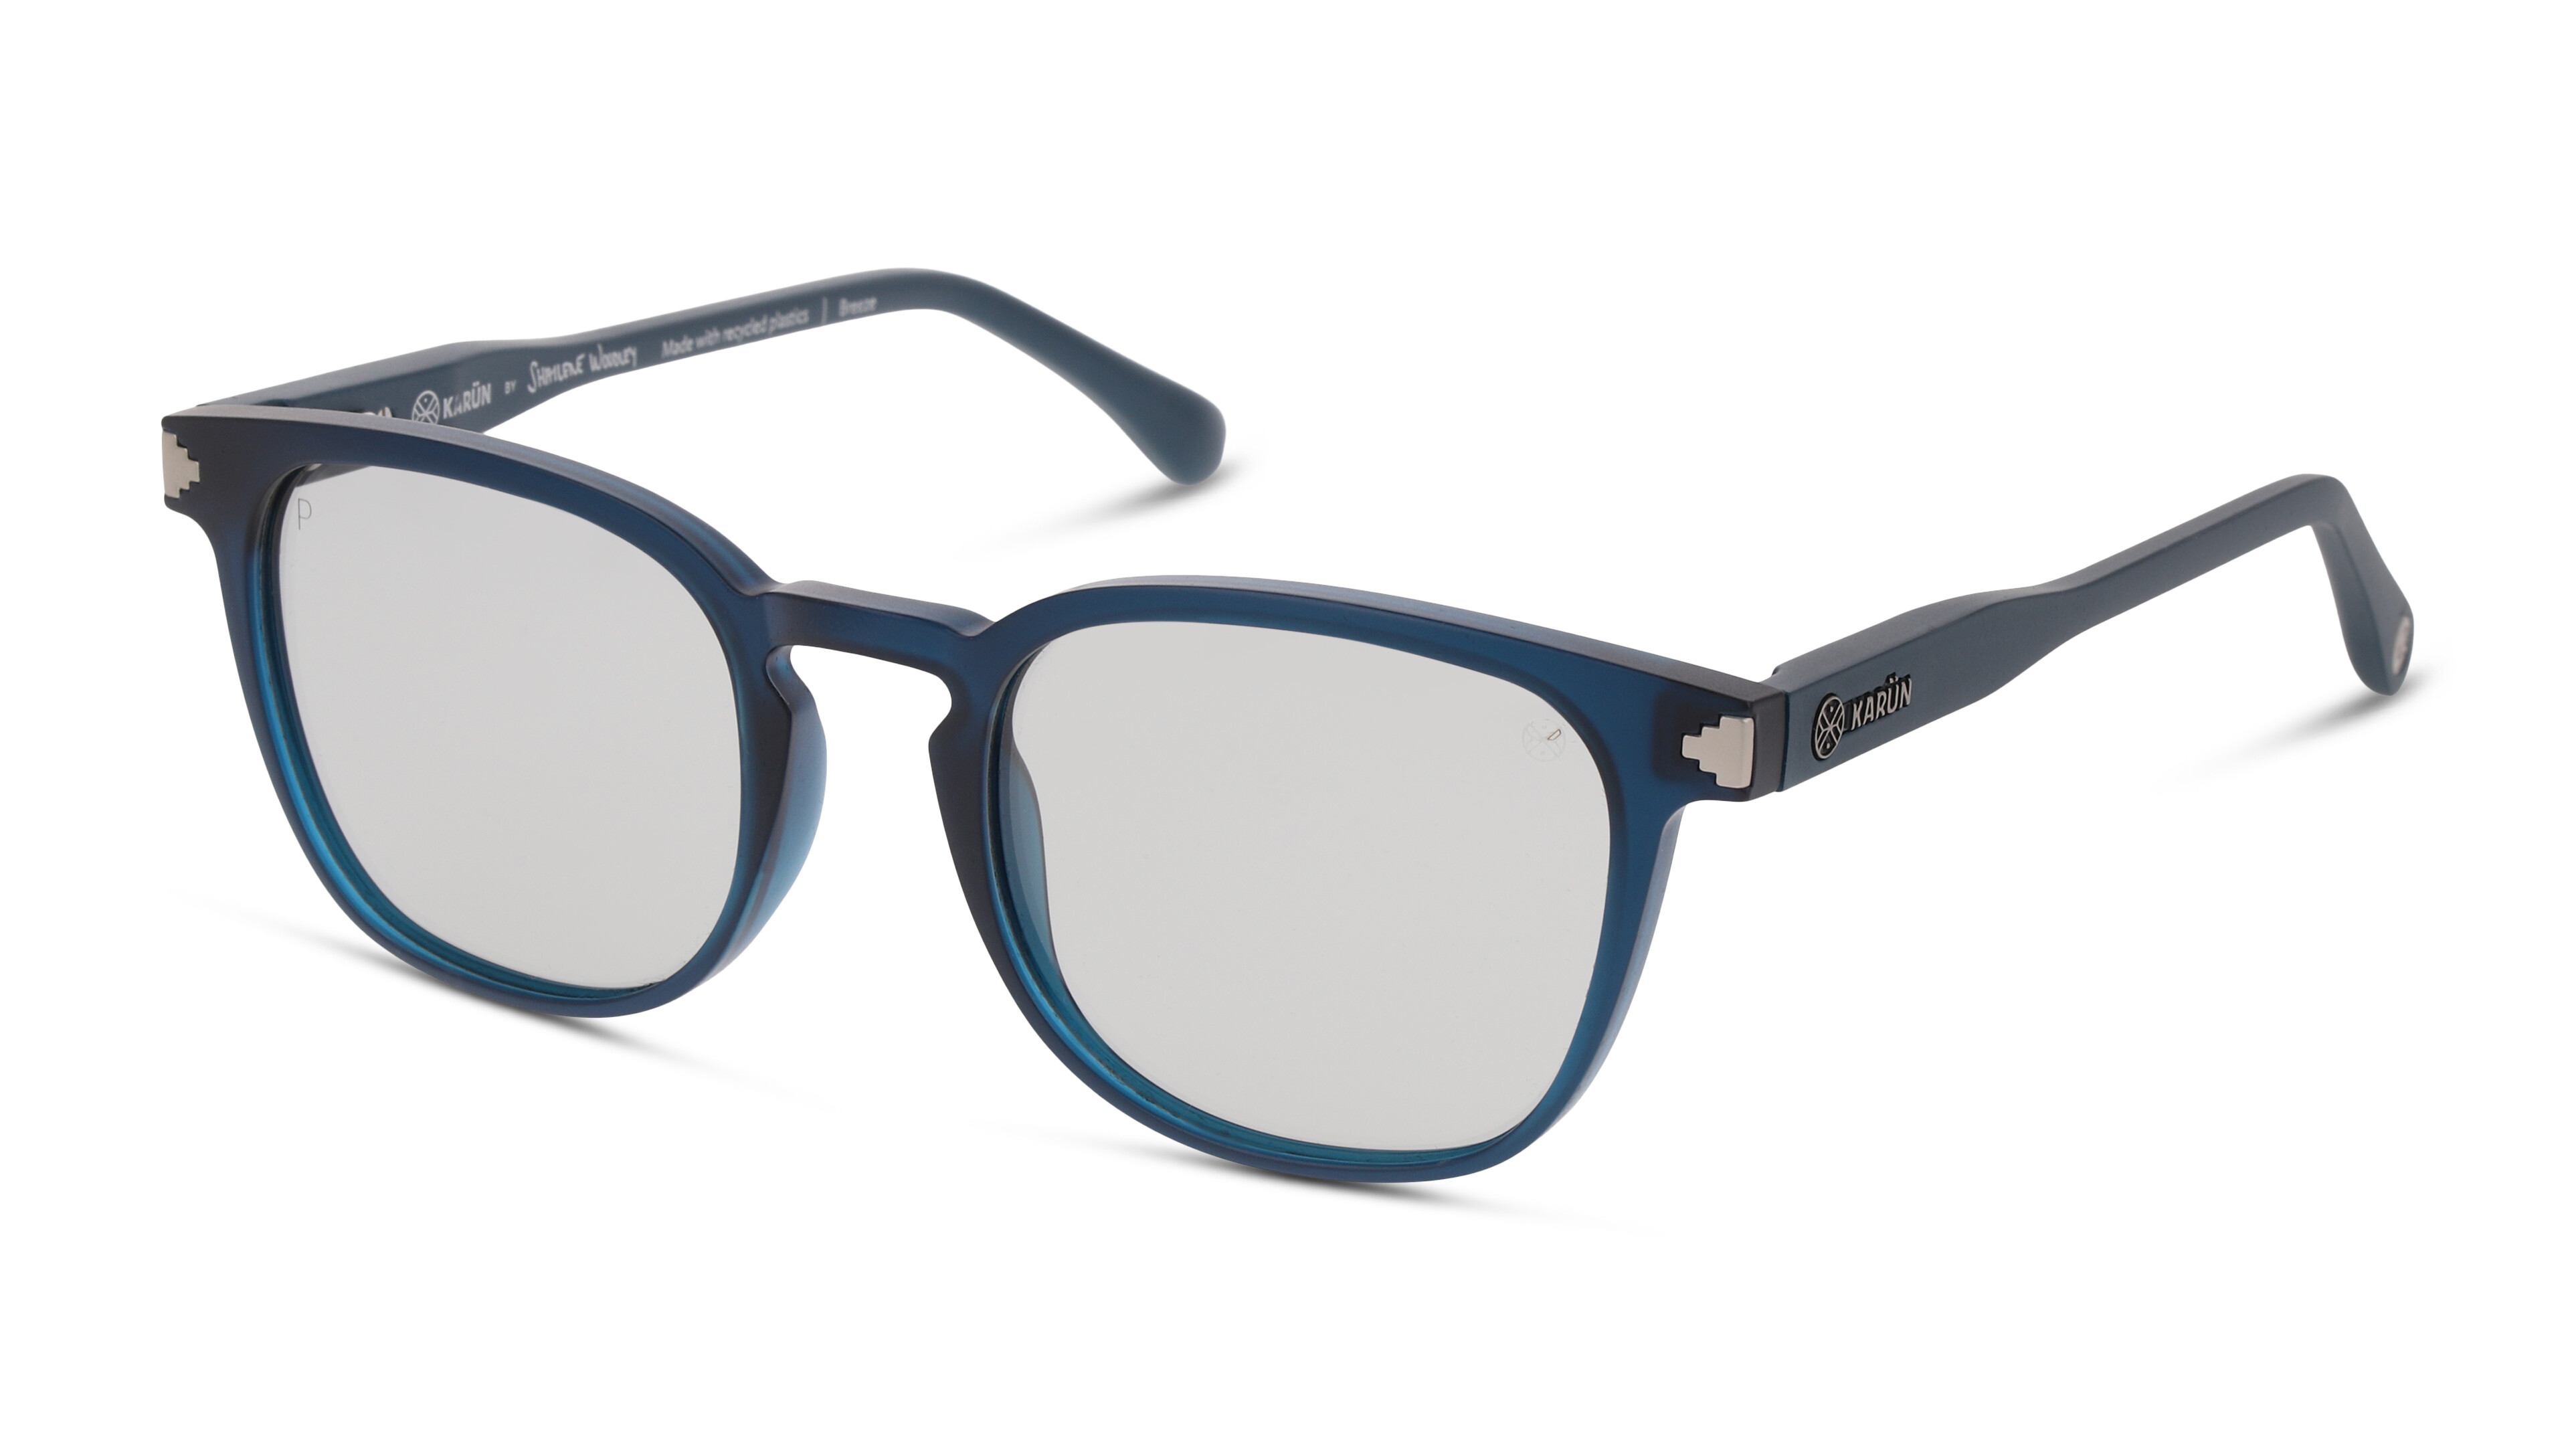 5060486617241-angle-sonnenbrille-karun-swfs0074-blue-crystal